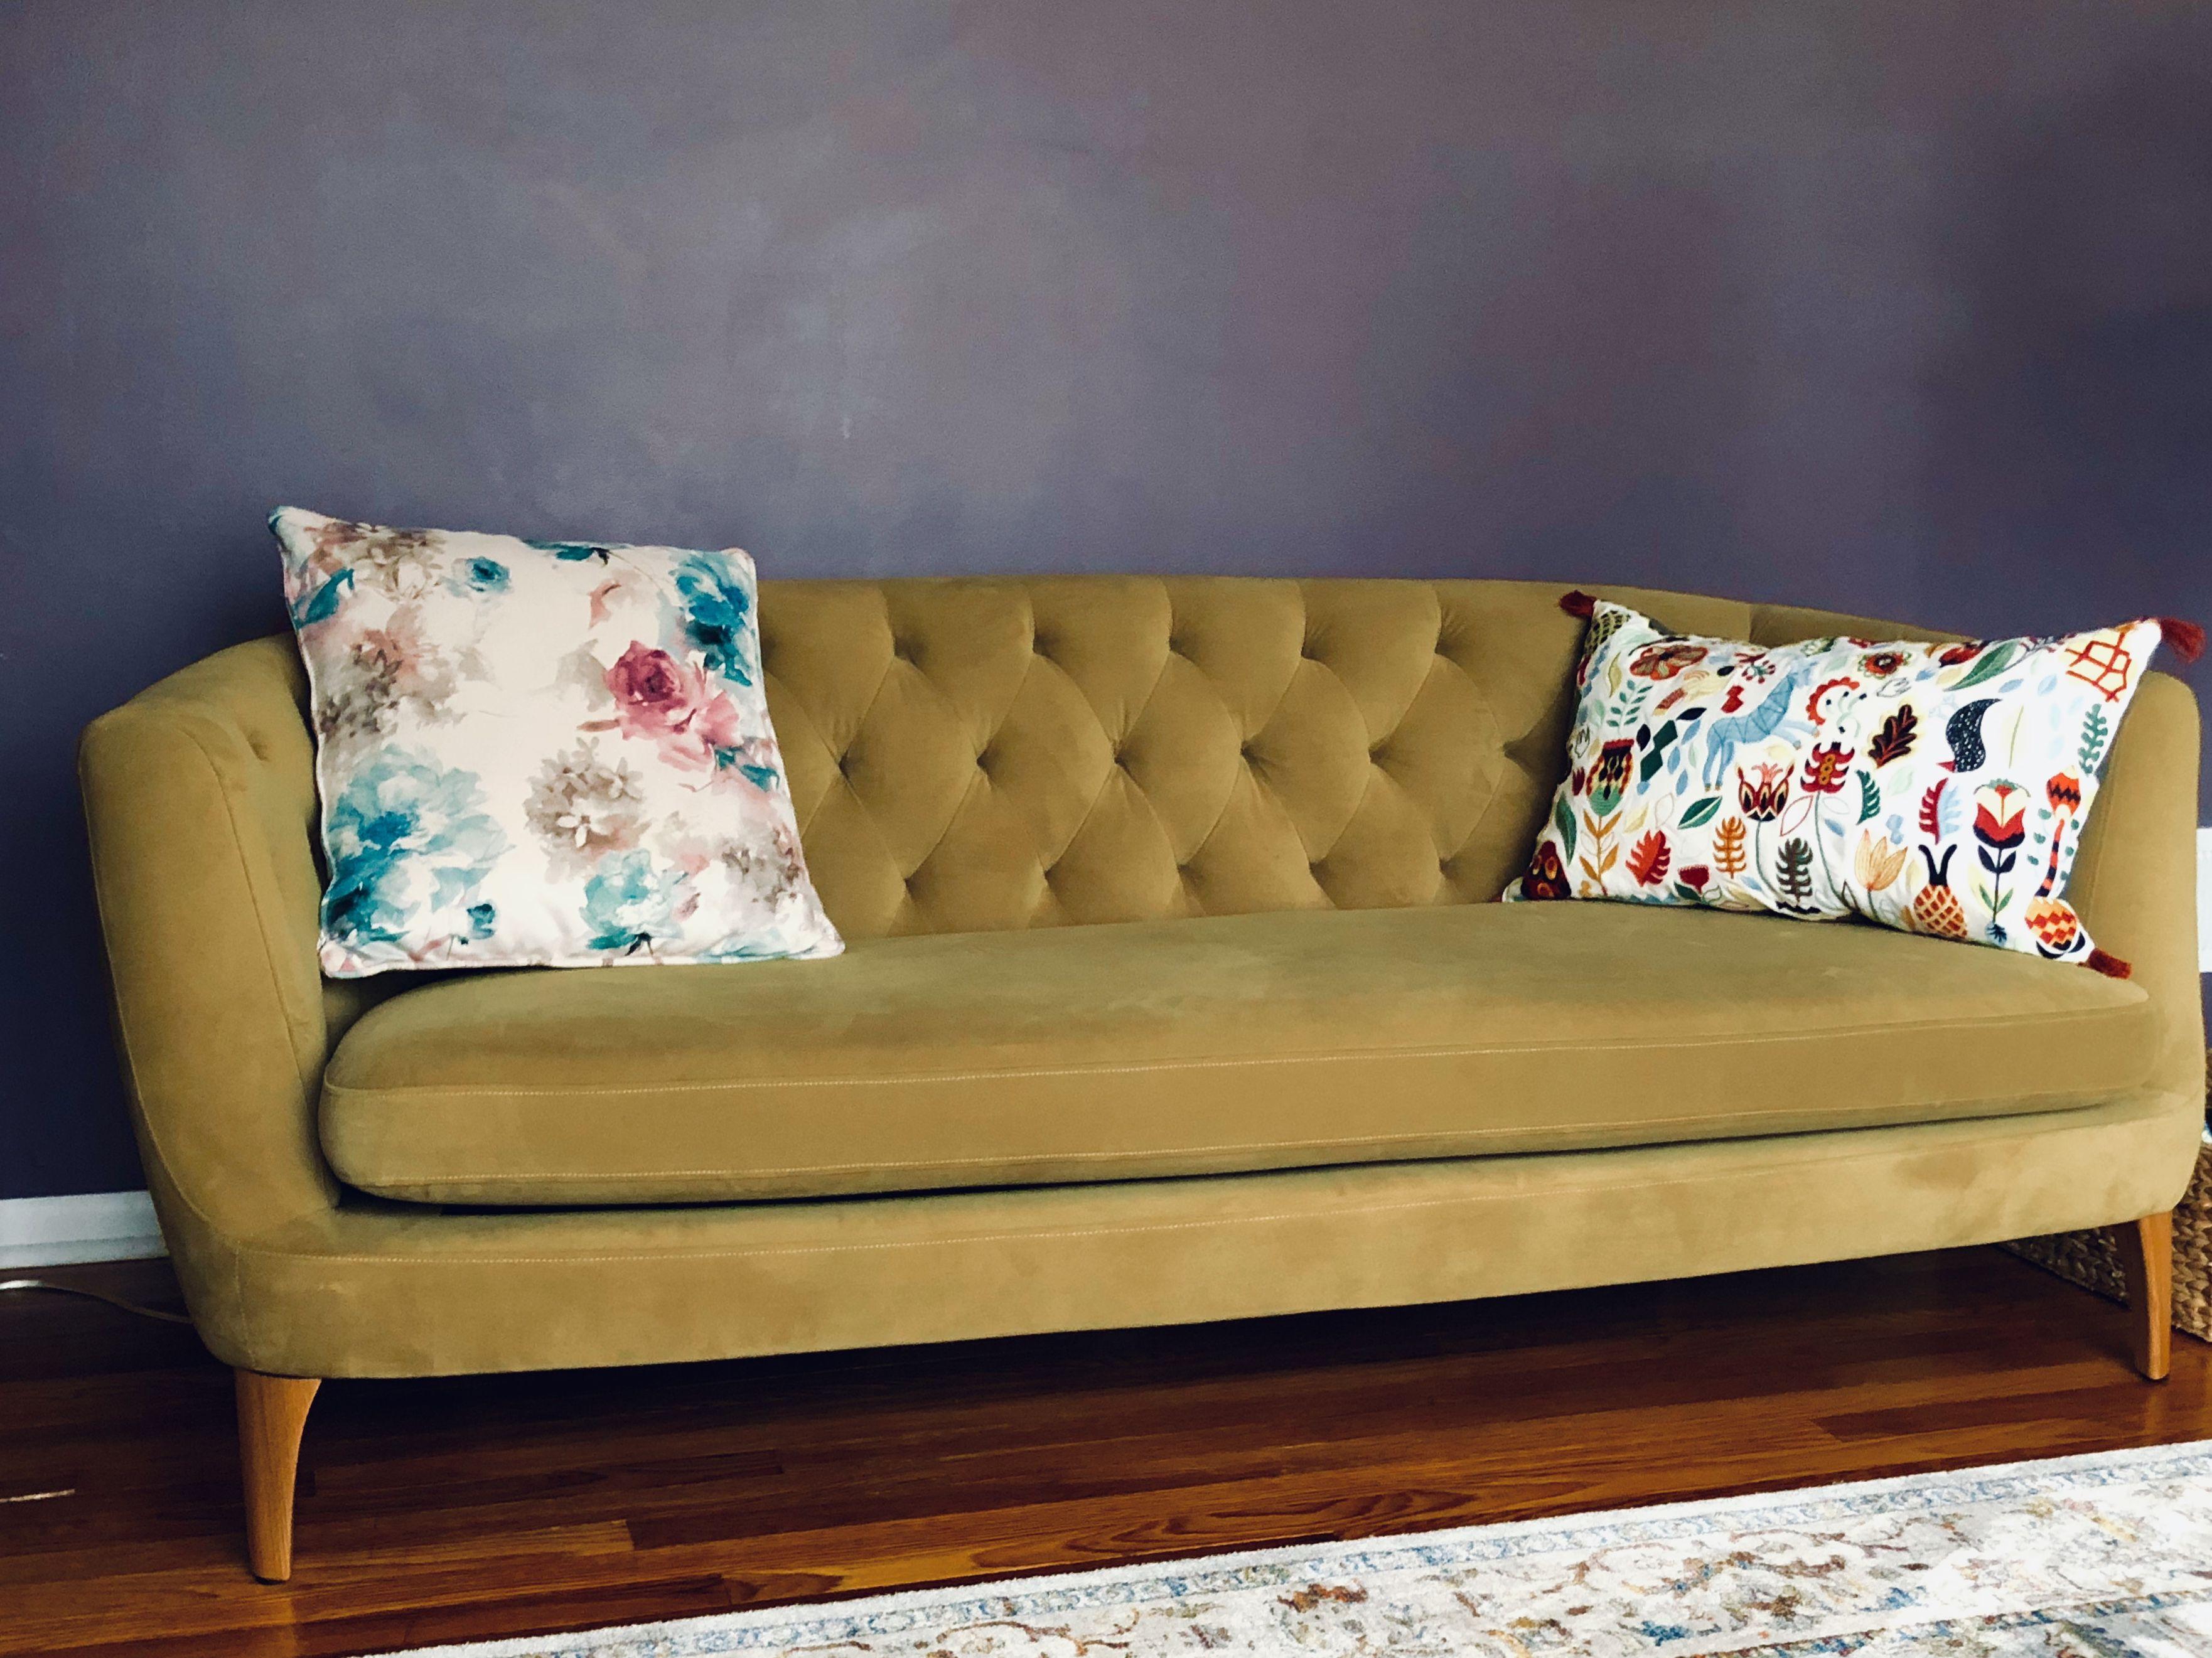 West Elm Lola Sofa Living Room Ideas Couch